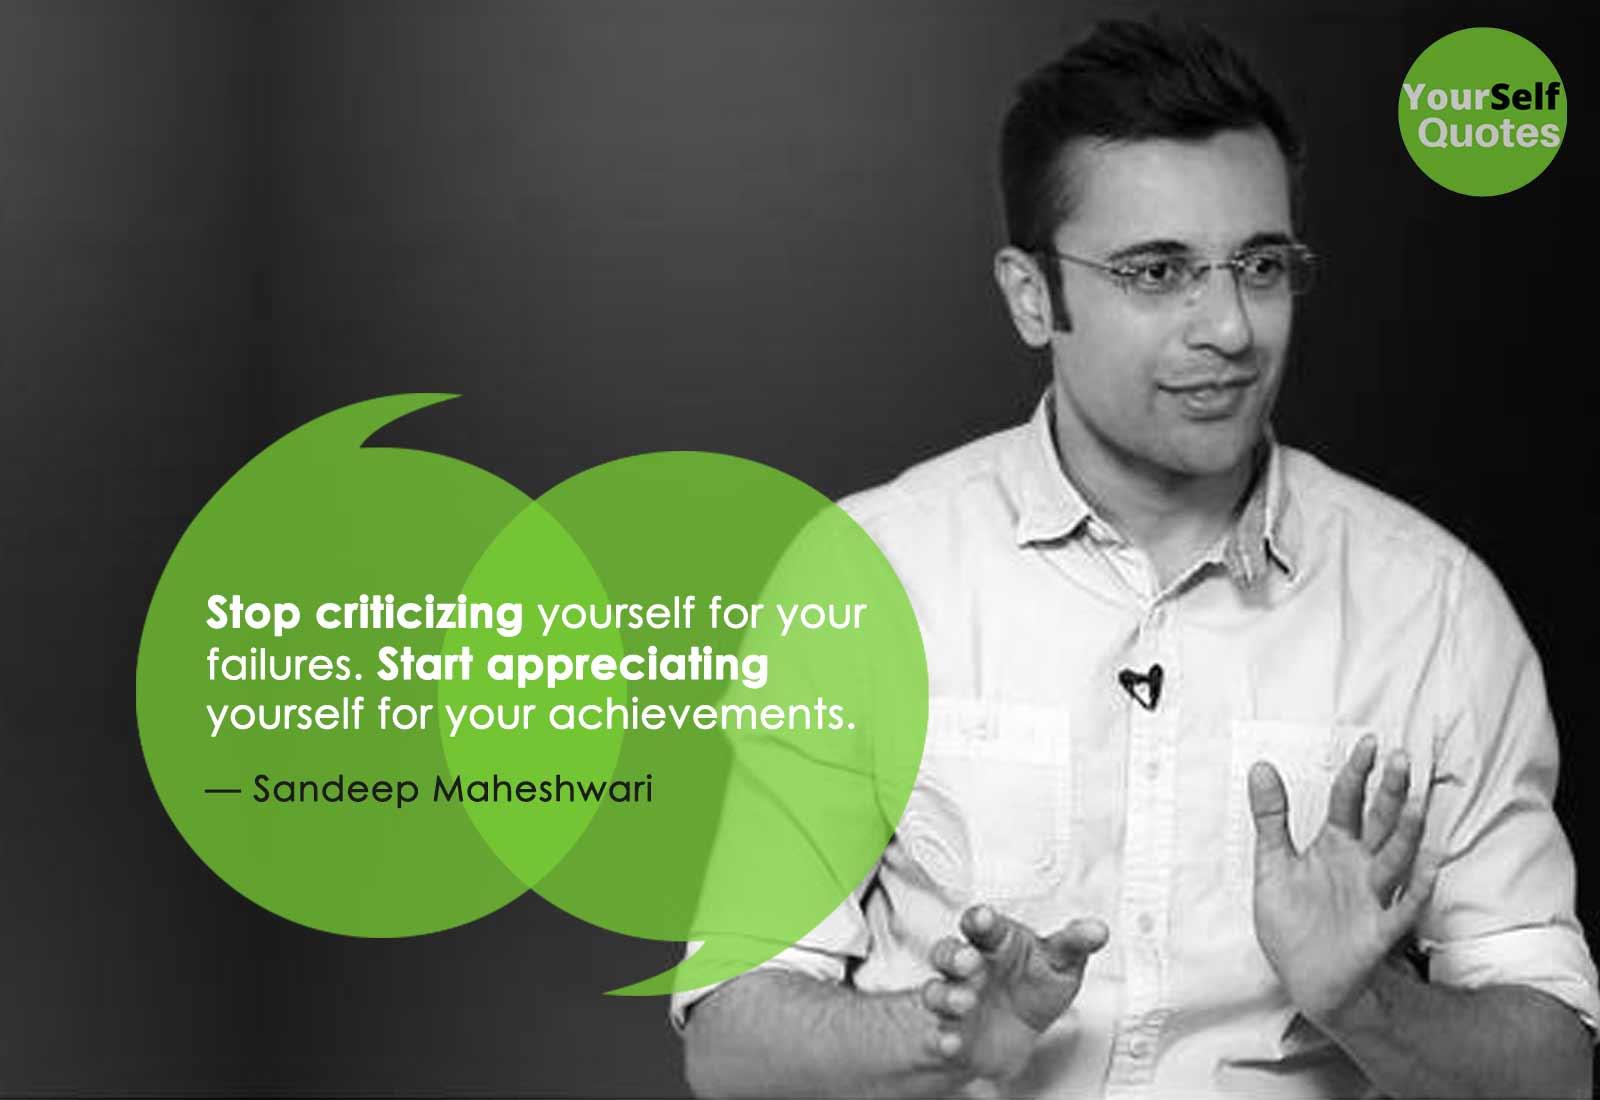 Sandeep Maheshwari Quotes And Sayings